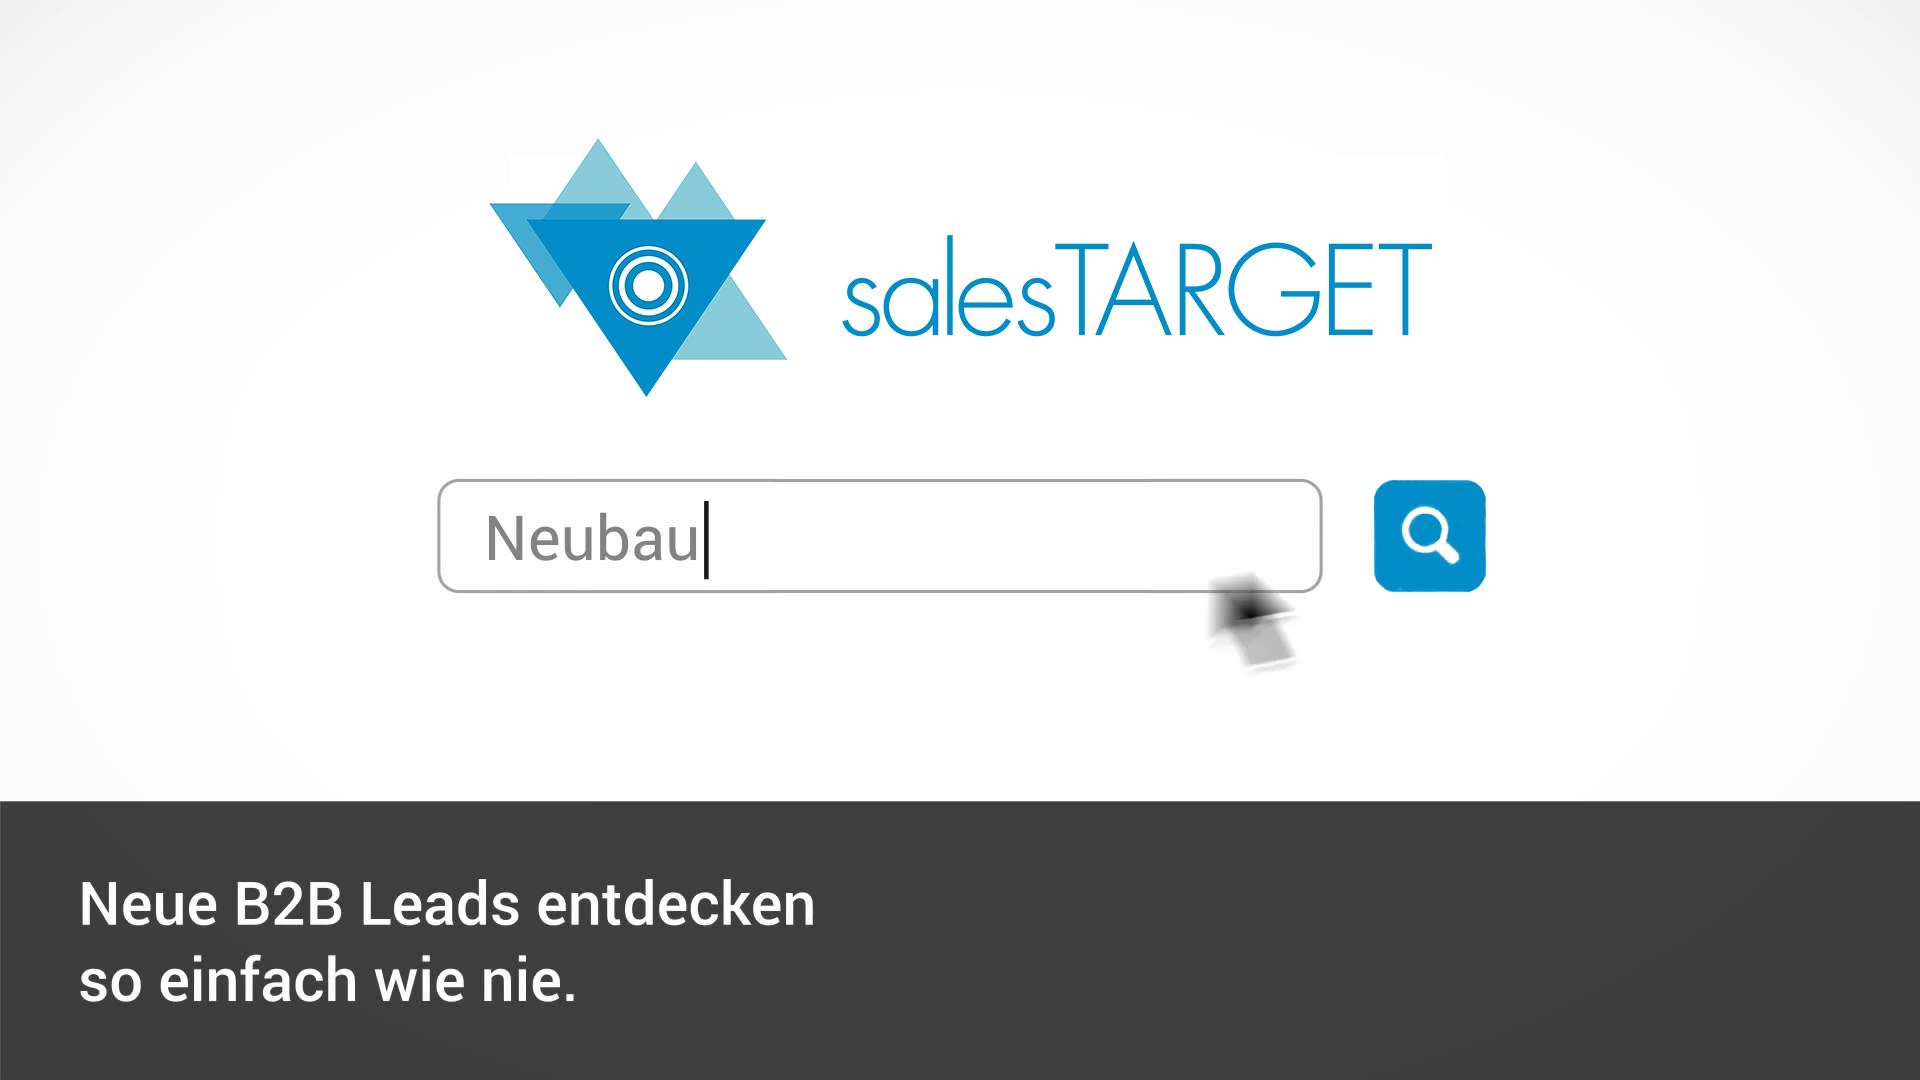 SalesTarget-videoscreen